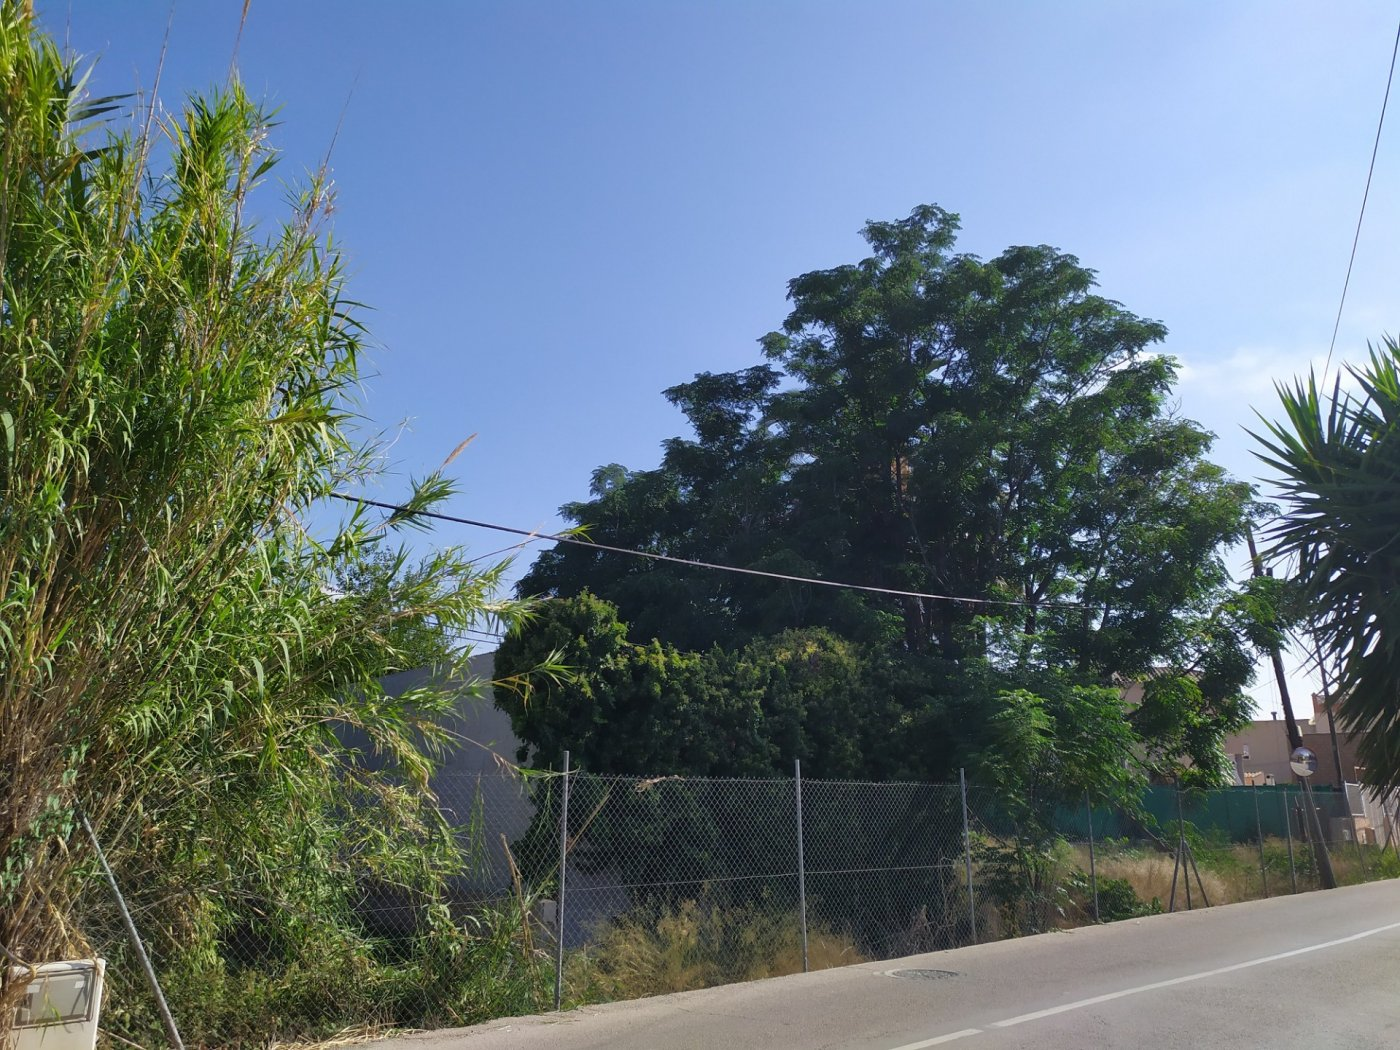 Gran terreno urbanizable en la arboleja - imagenInmueble5